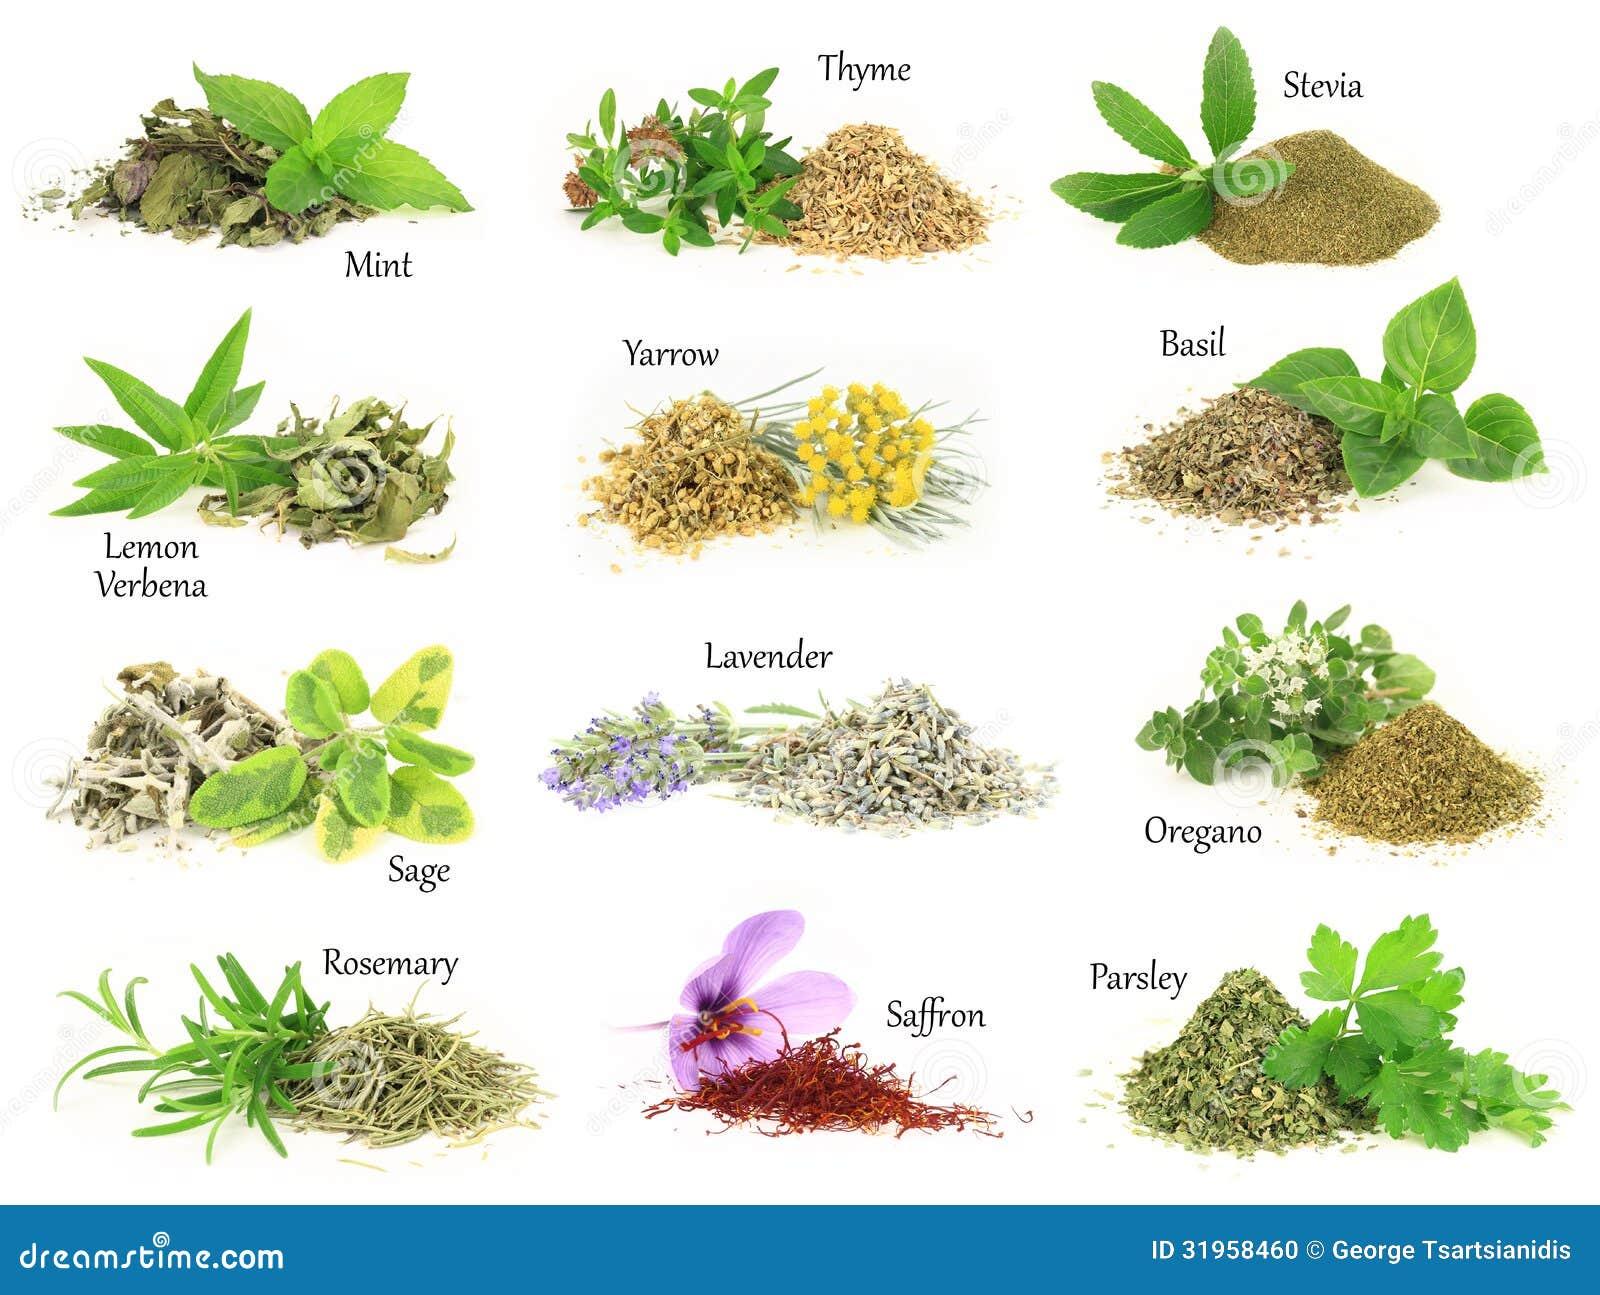 herbes aromatiques fra ches et s ches photo stock image du lame monnayage 31958460. Black Bedroom Furniture Sets. Home Design Ideas